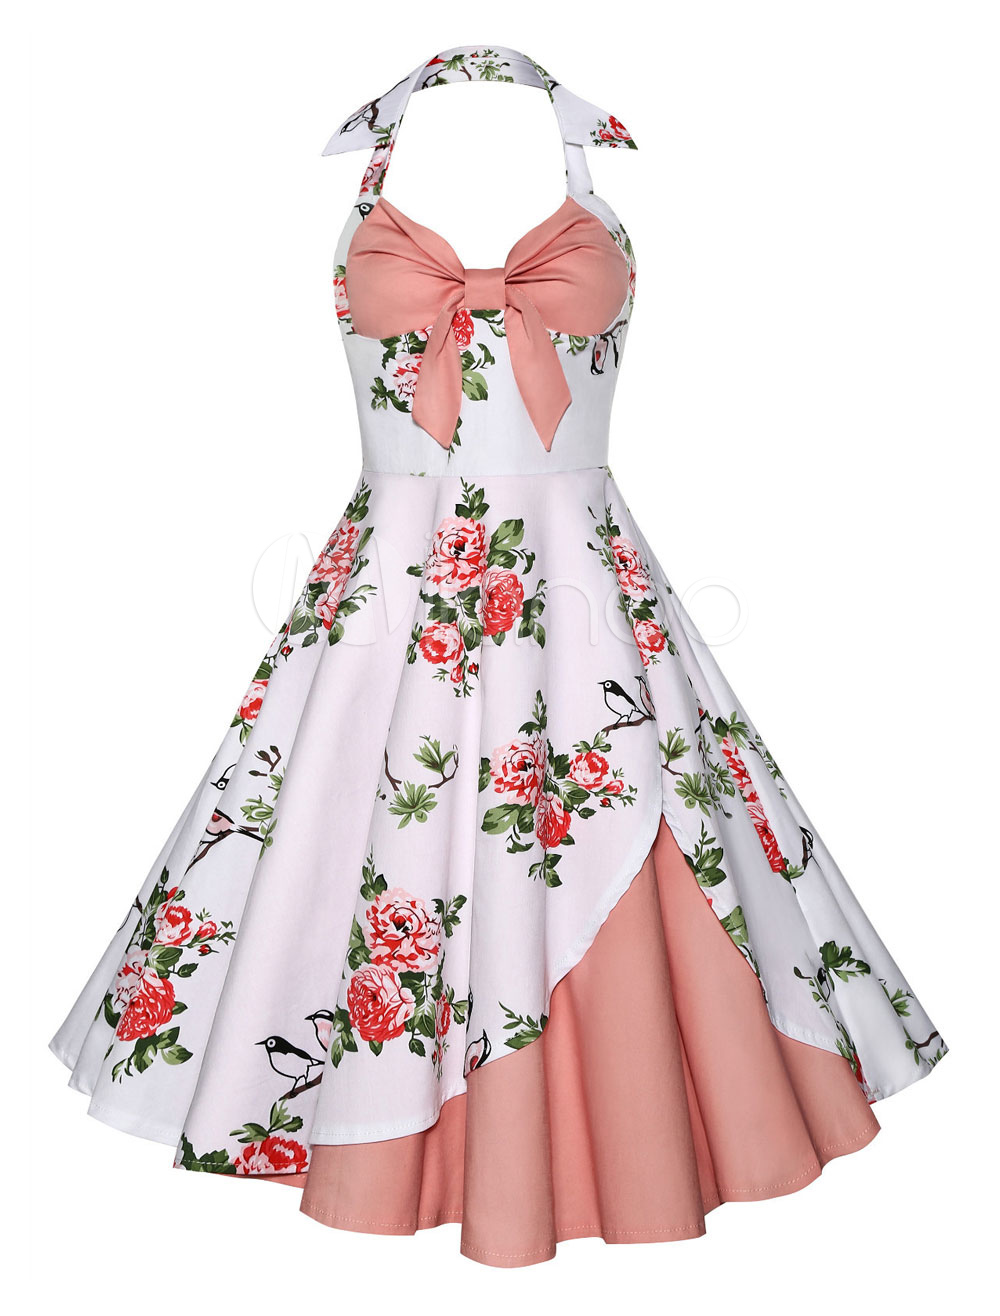 White Vintage Dress Floral 1950s Halter Sleeveless Backless Rockabilly Dresses For Women